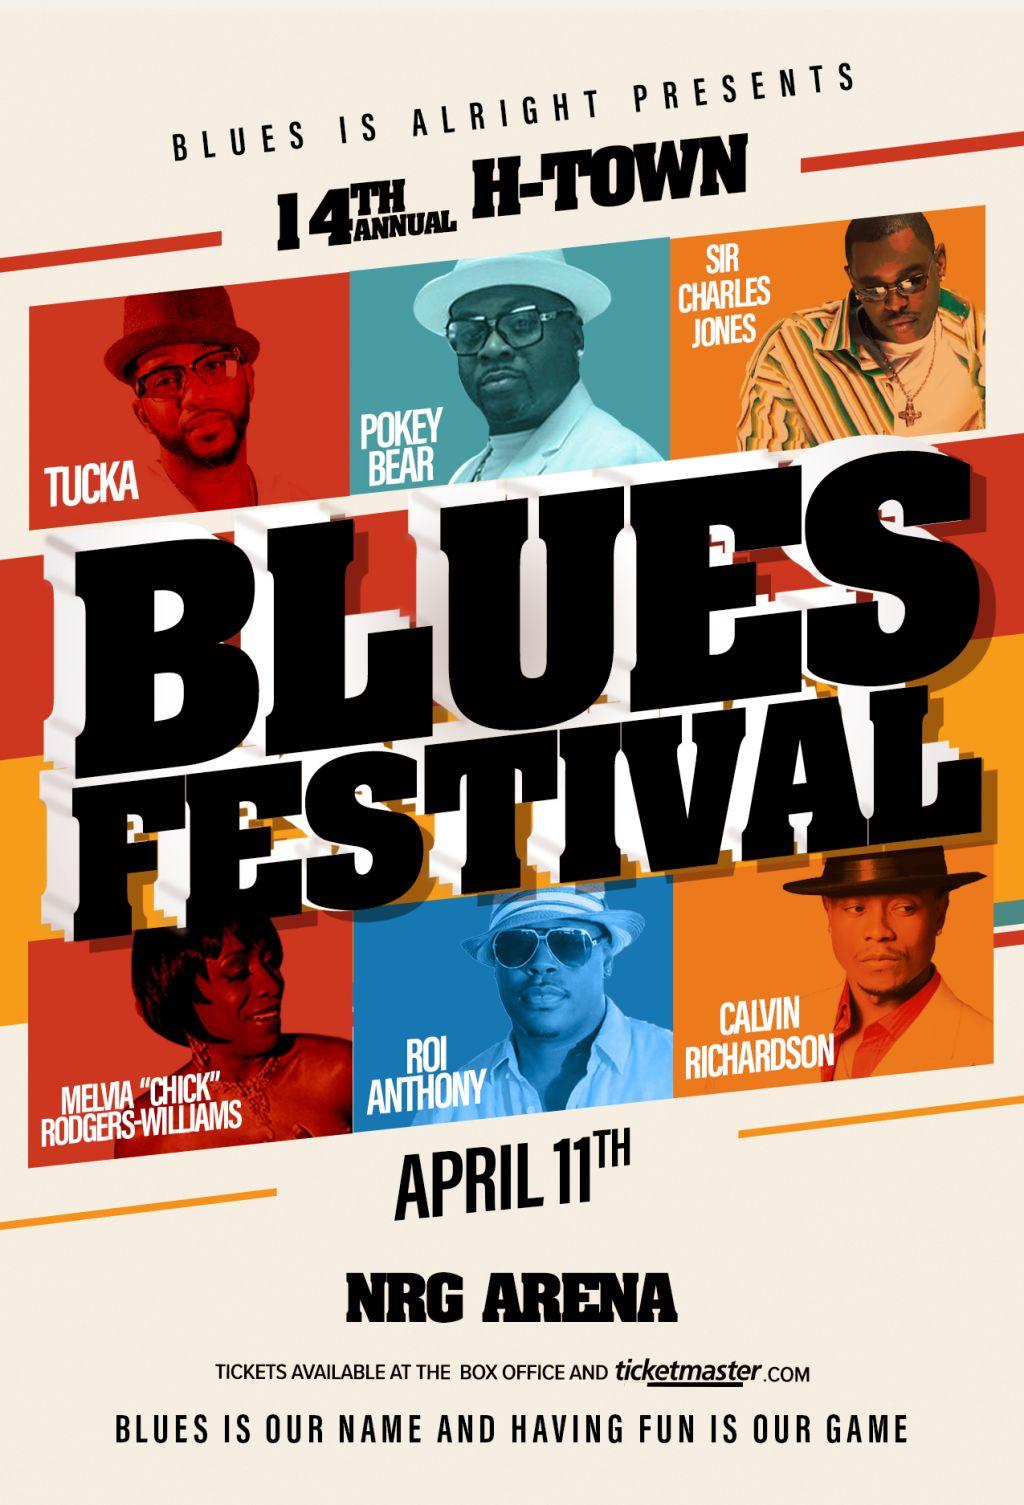 14th H-Town Blues Festival